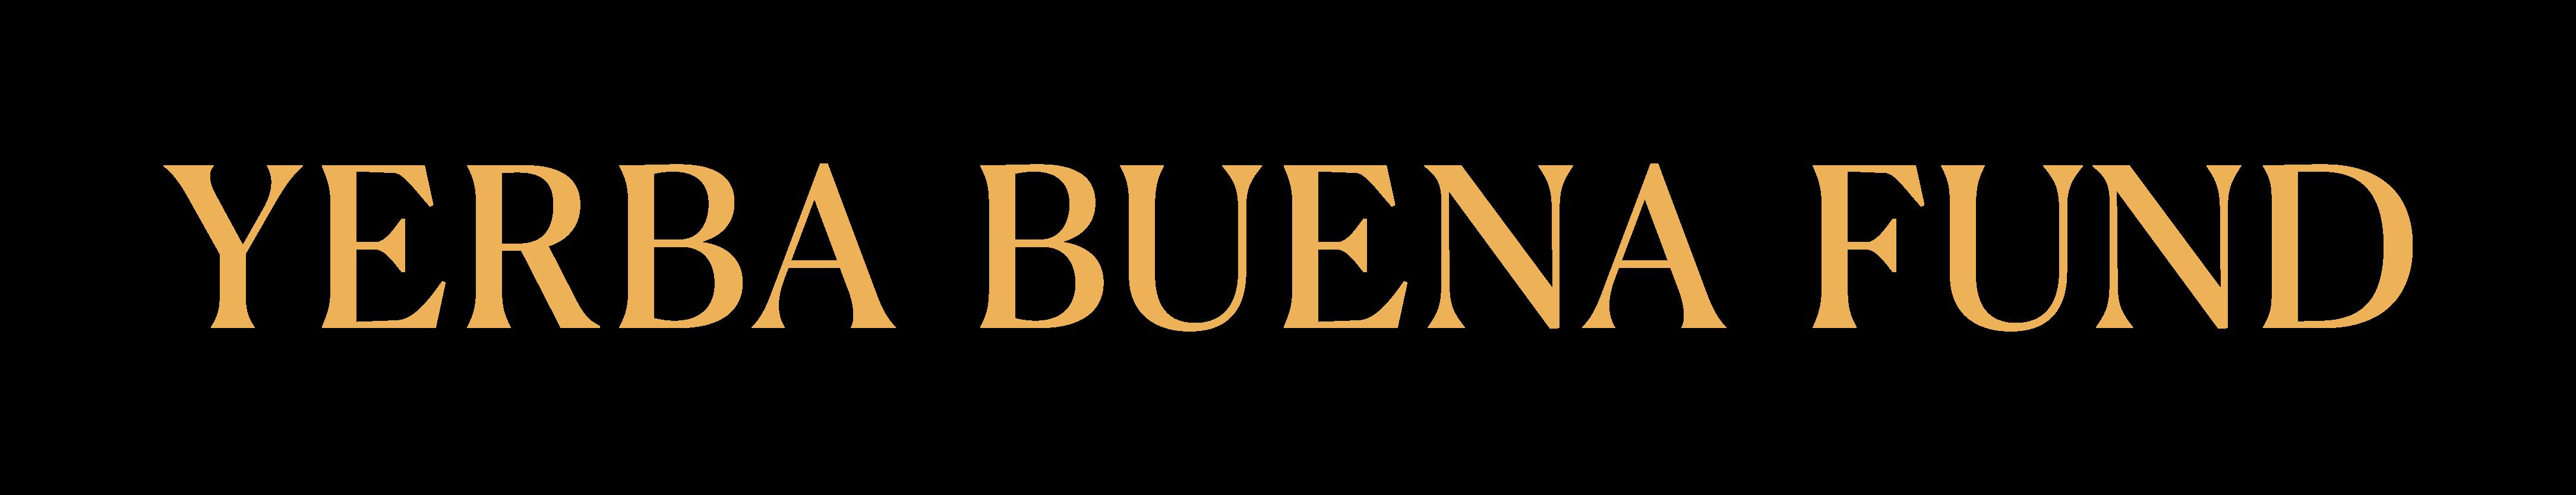 Yerba Buena Fund